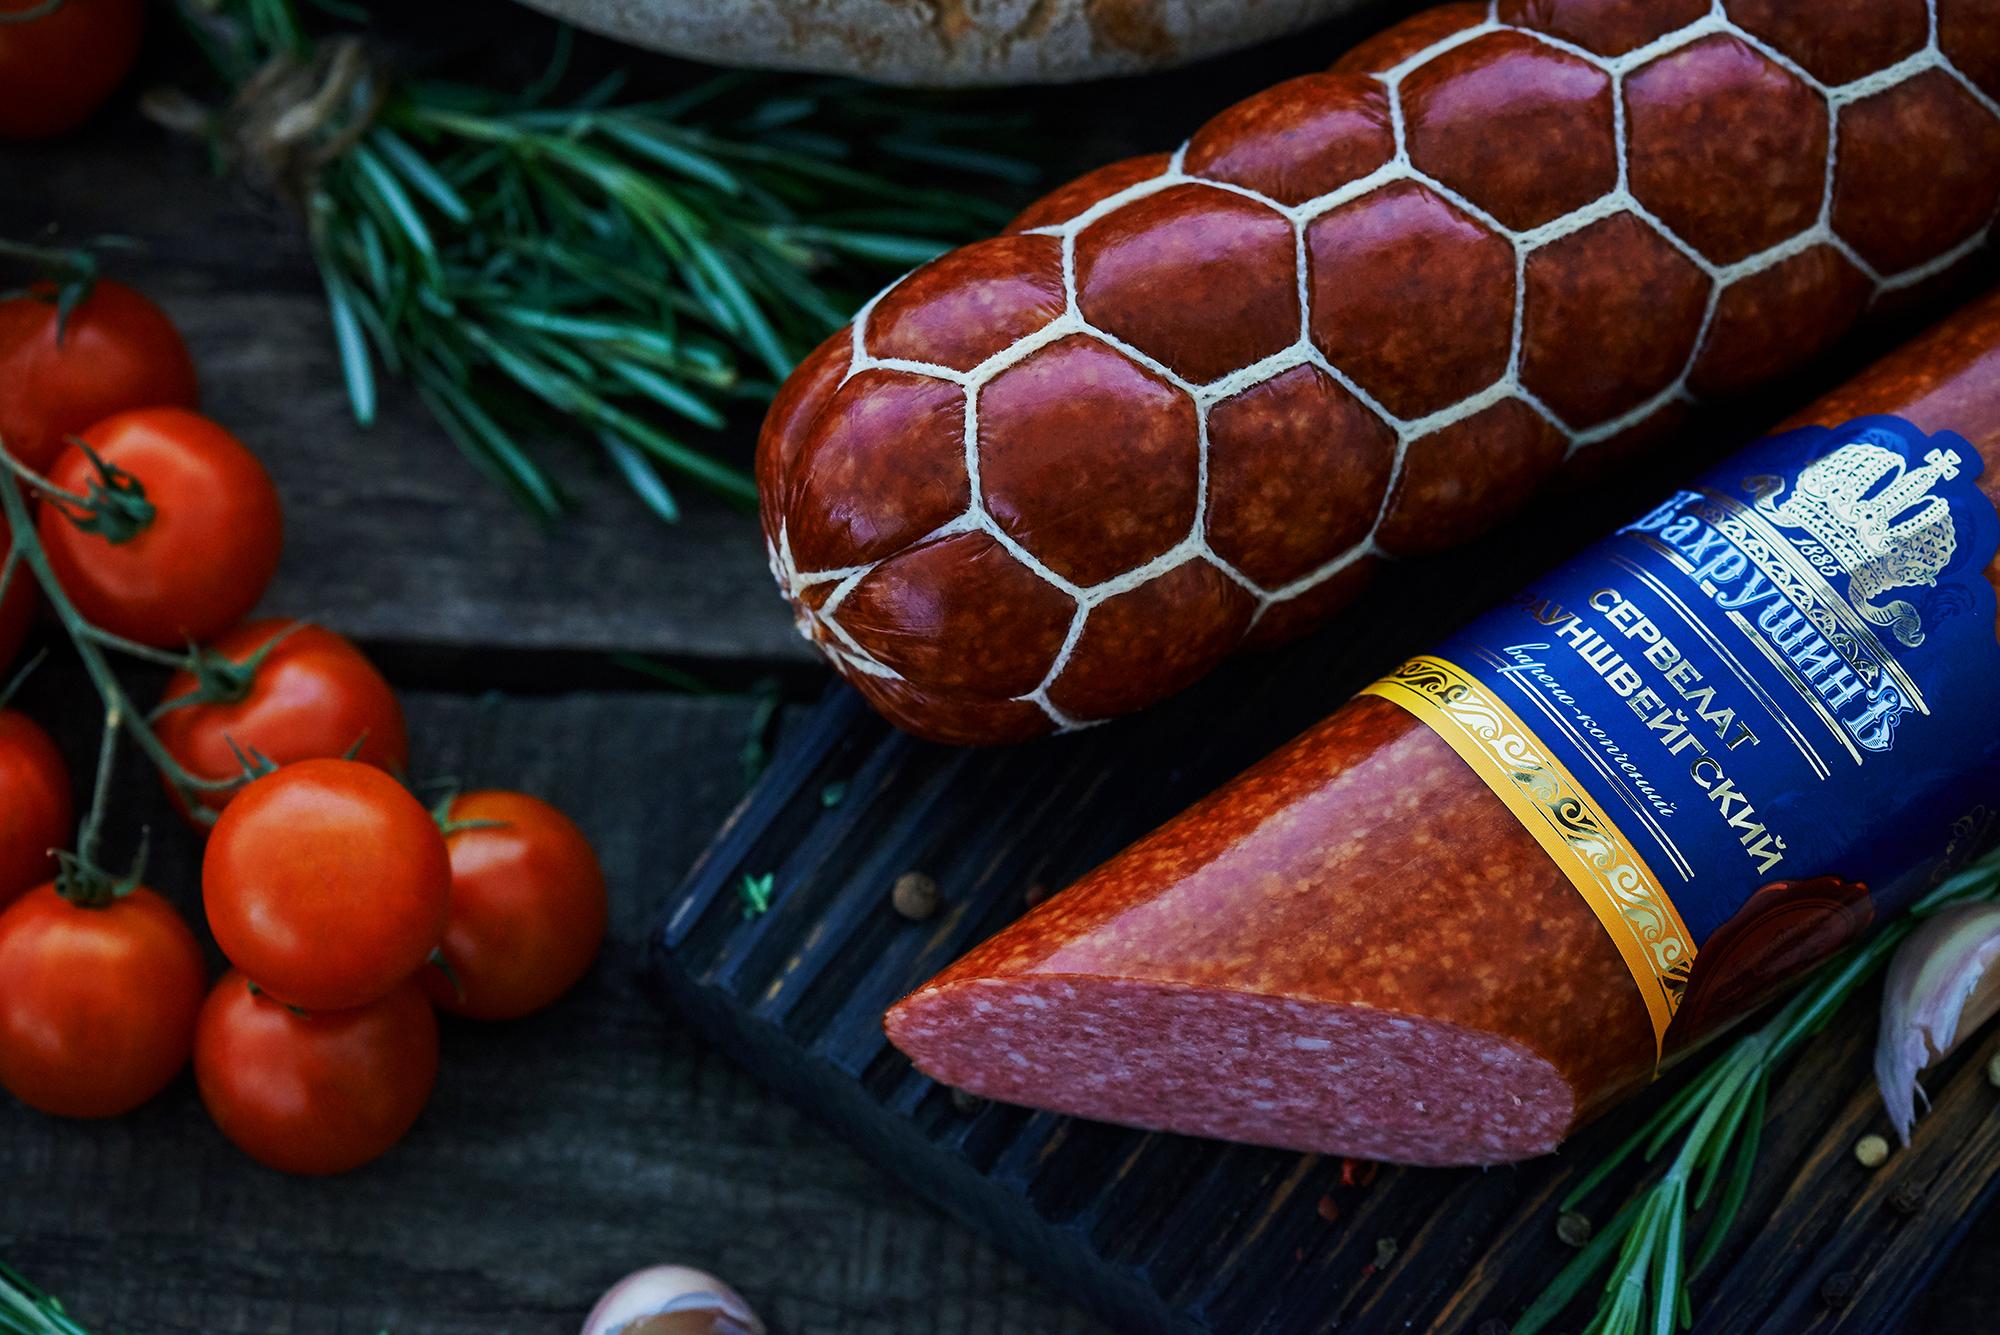 Варено-копченые колбасы Бархушинъ